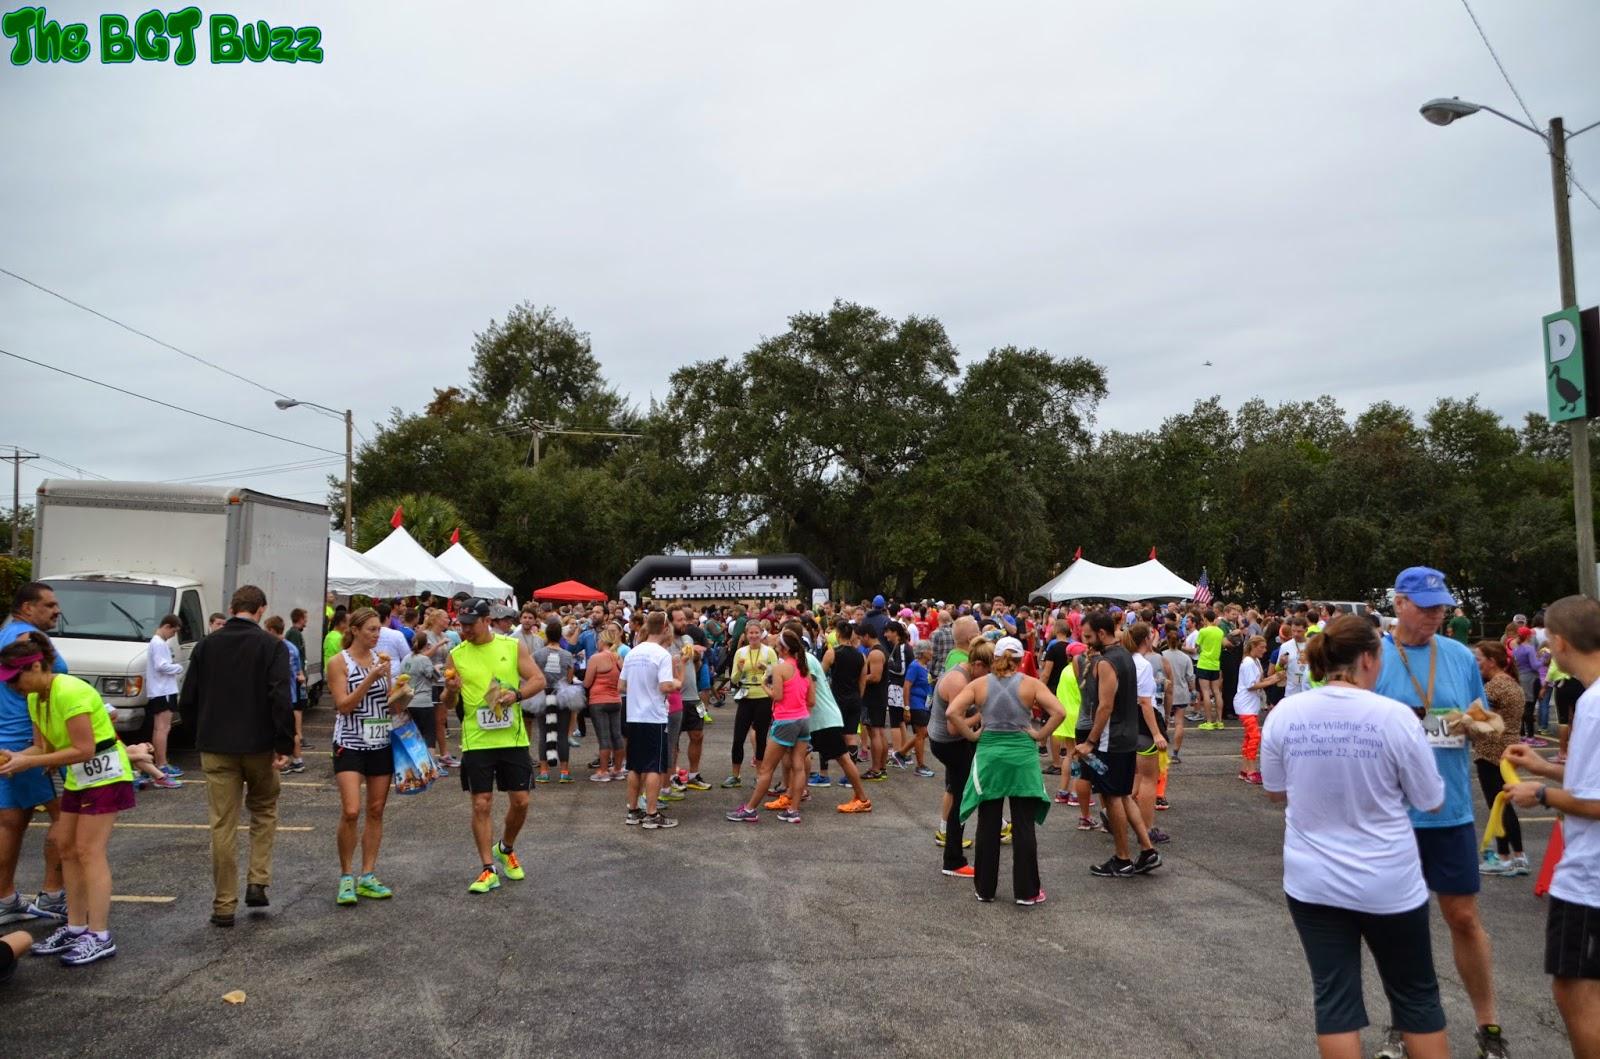 The Bgt Buzz Run For Wildife 5k 2014 At Busch Gardens Tampa